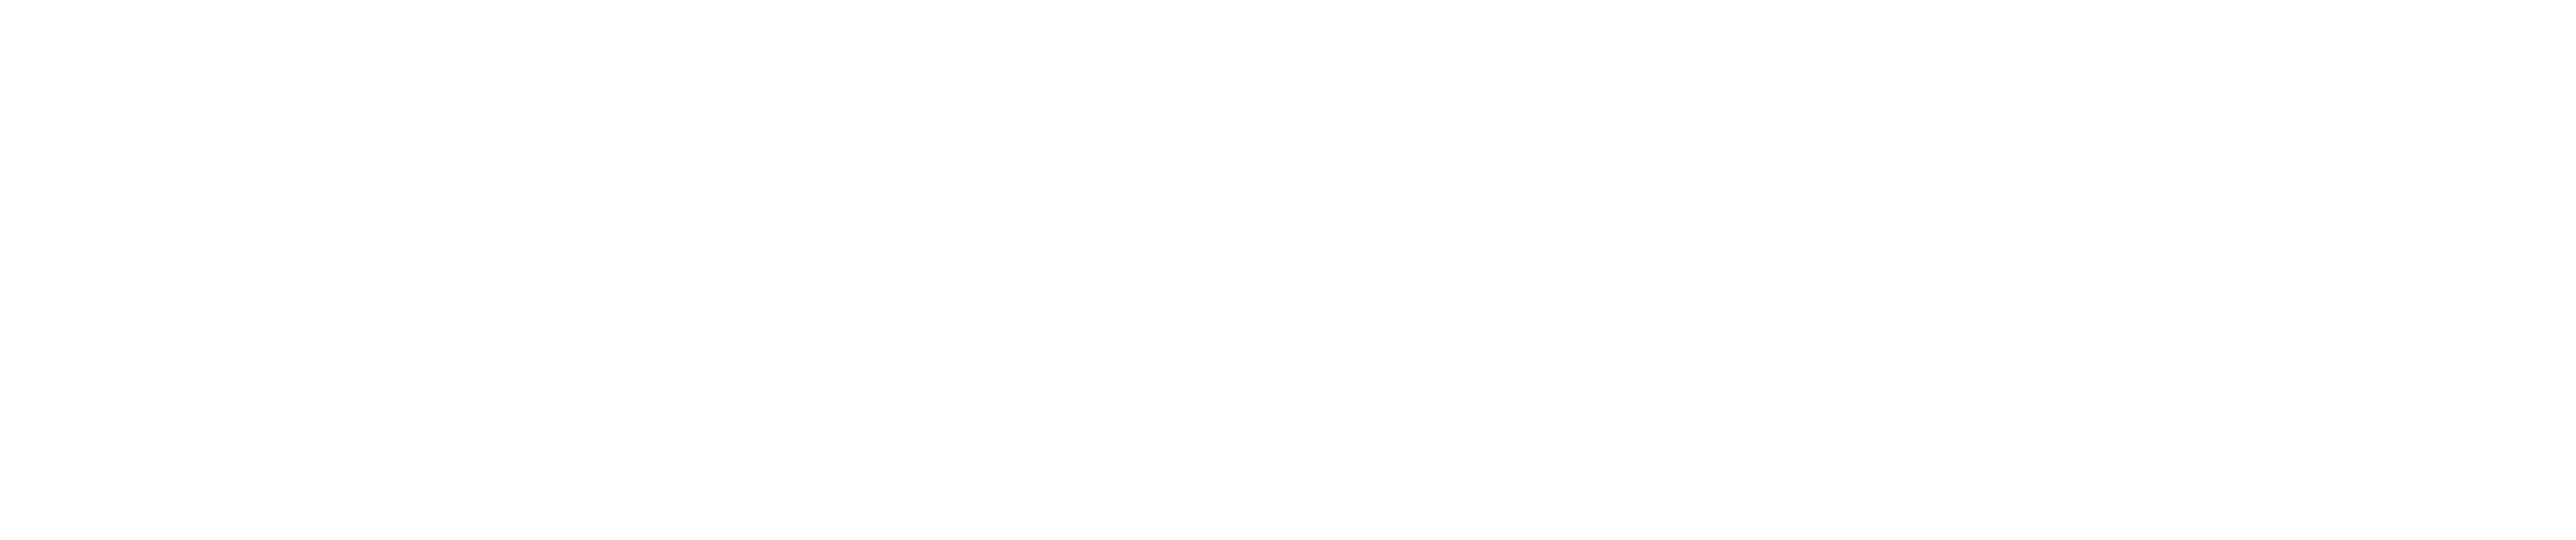 Respira Yoga Tv